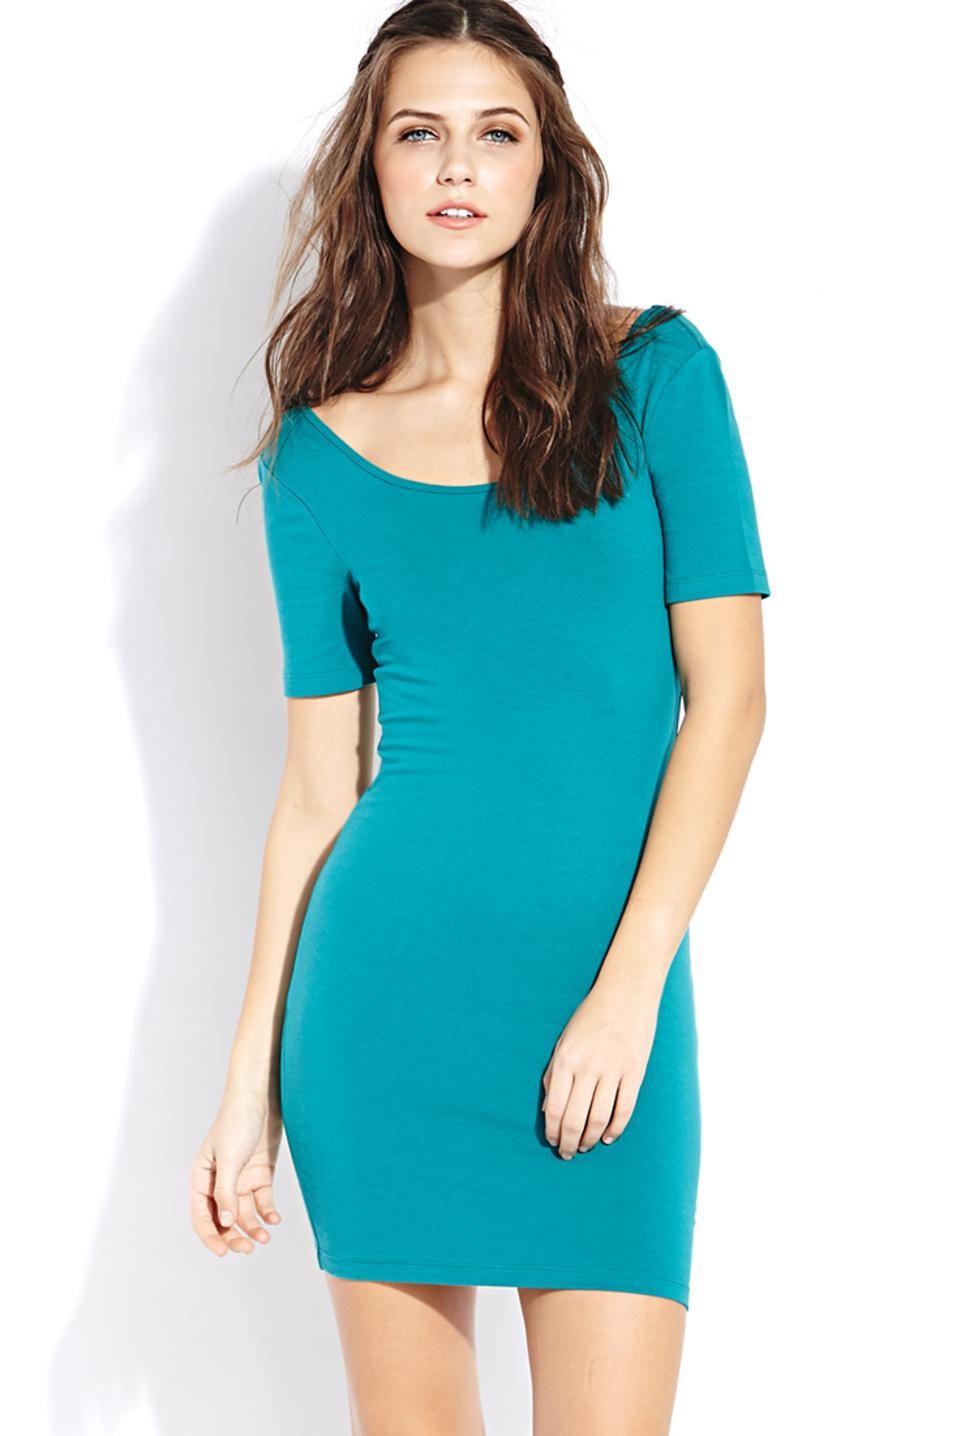 Petite Gemma Low Scoop Back Bodycon Dress | Bodycon Dresses ...